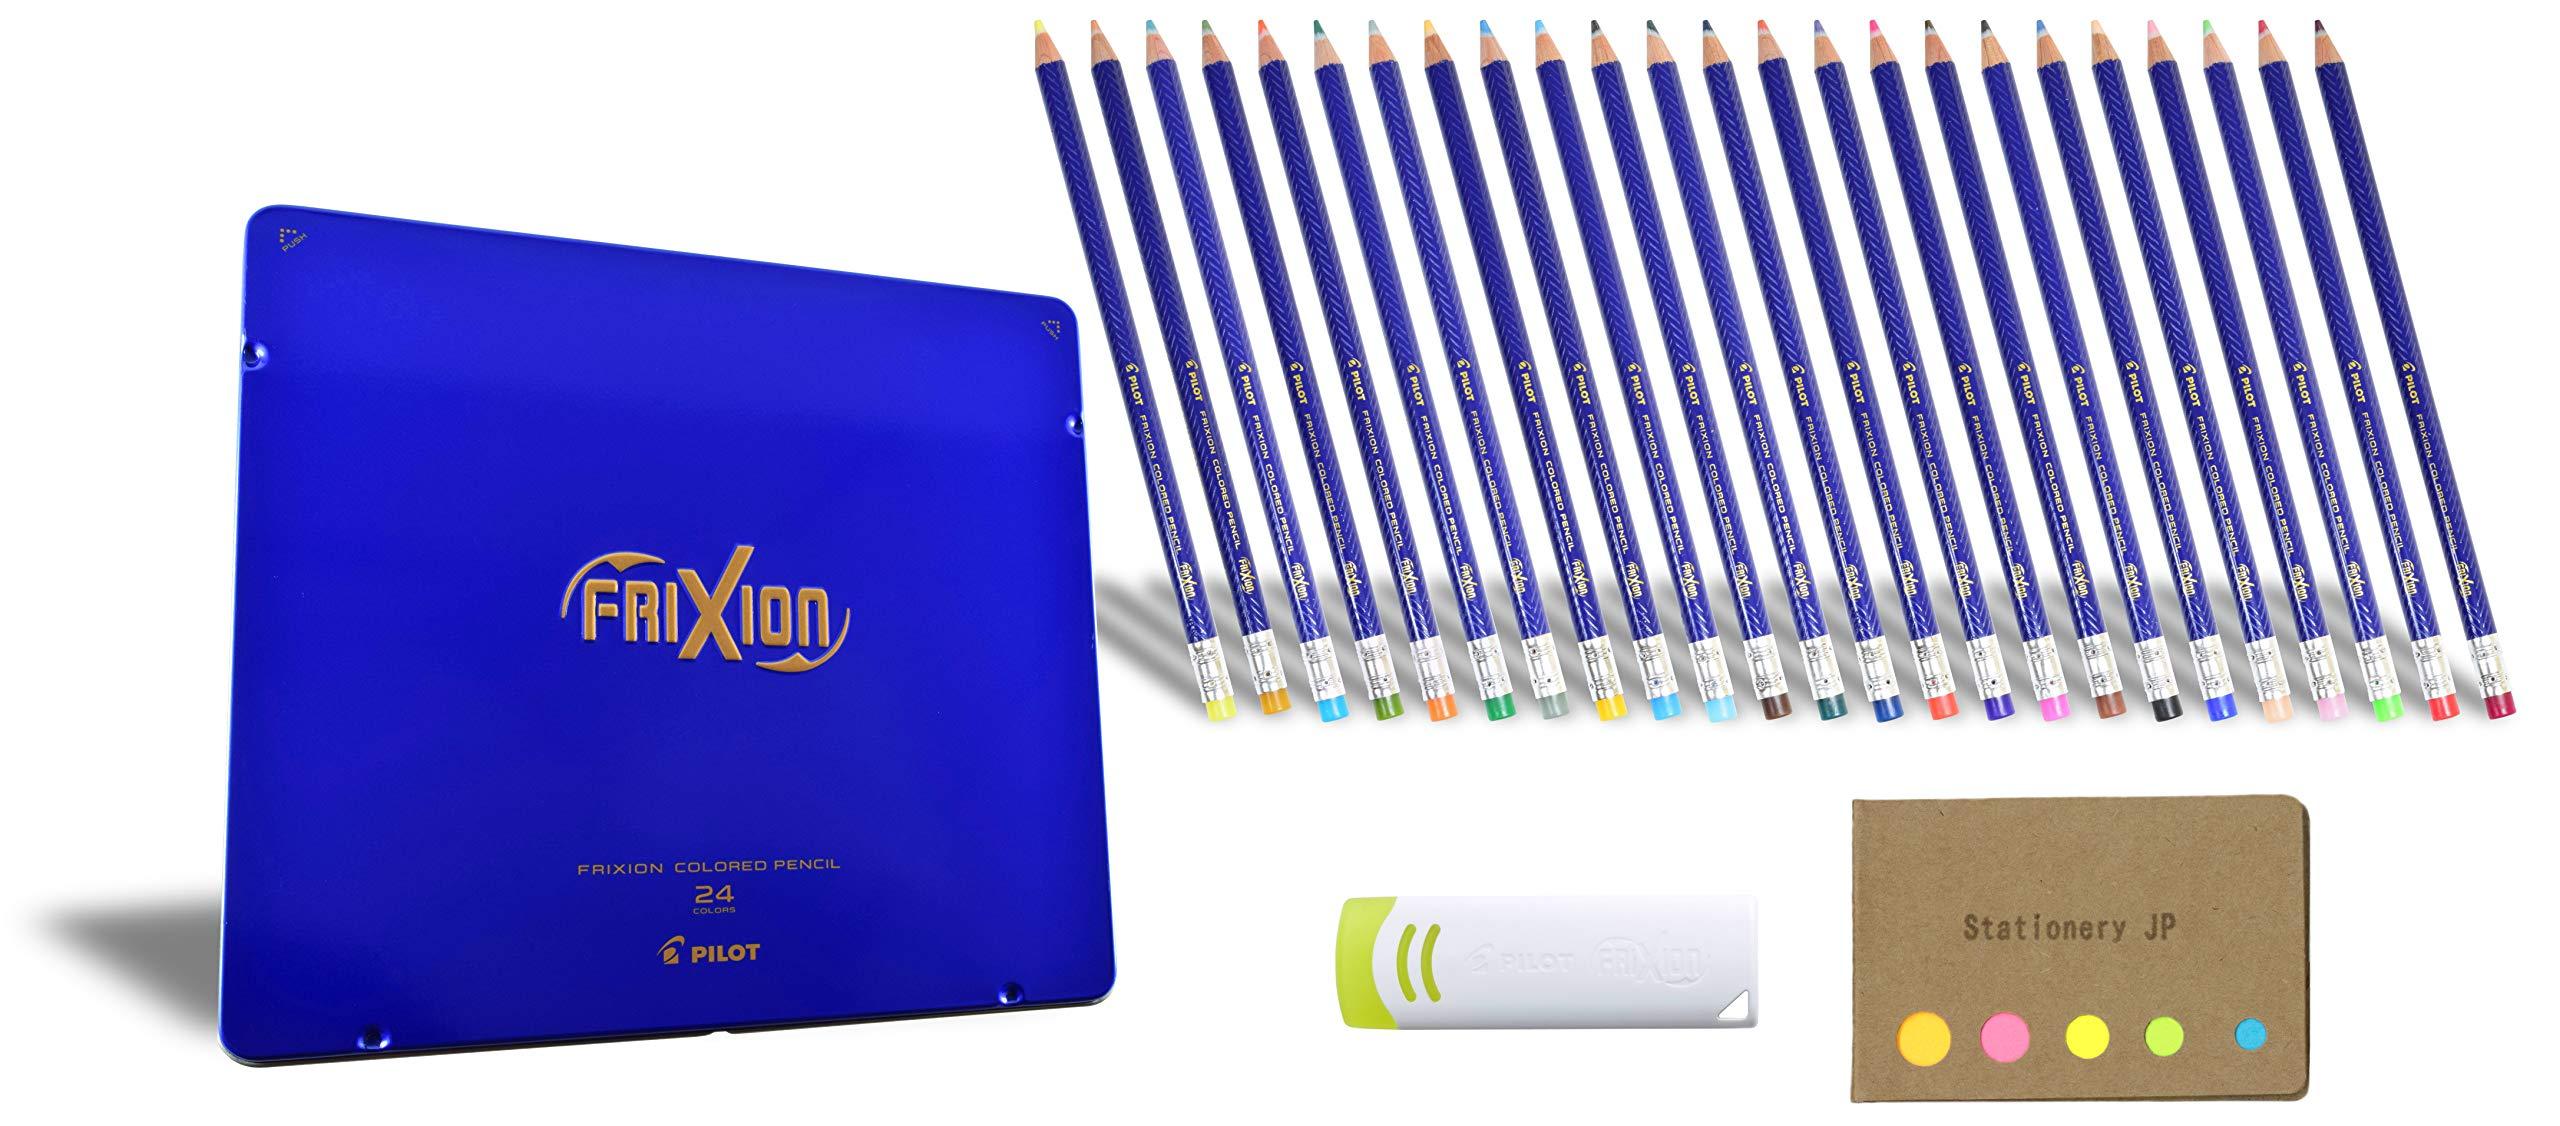 Pilot FriXion Erasable Colored Pencil 24 Color, Frixion Eraser, Pen Case, Sticky Notes Value Set